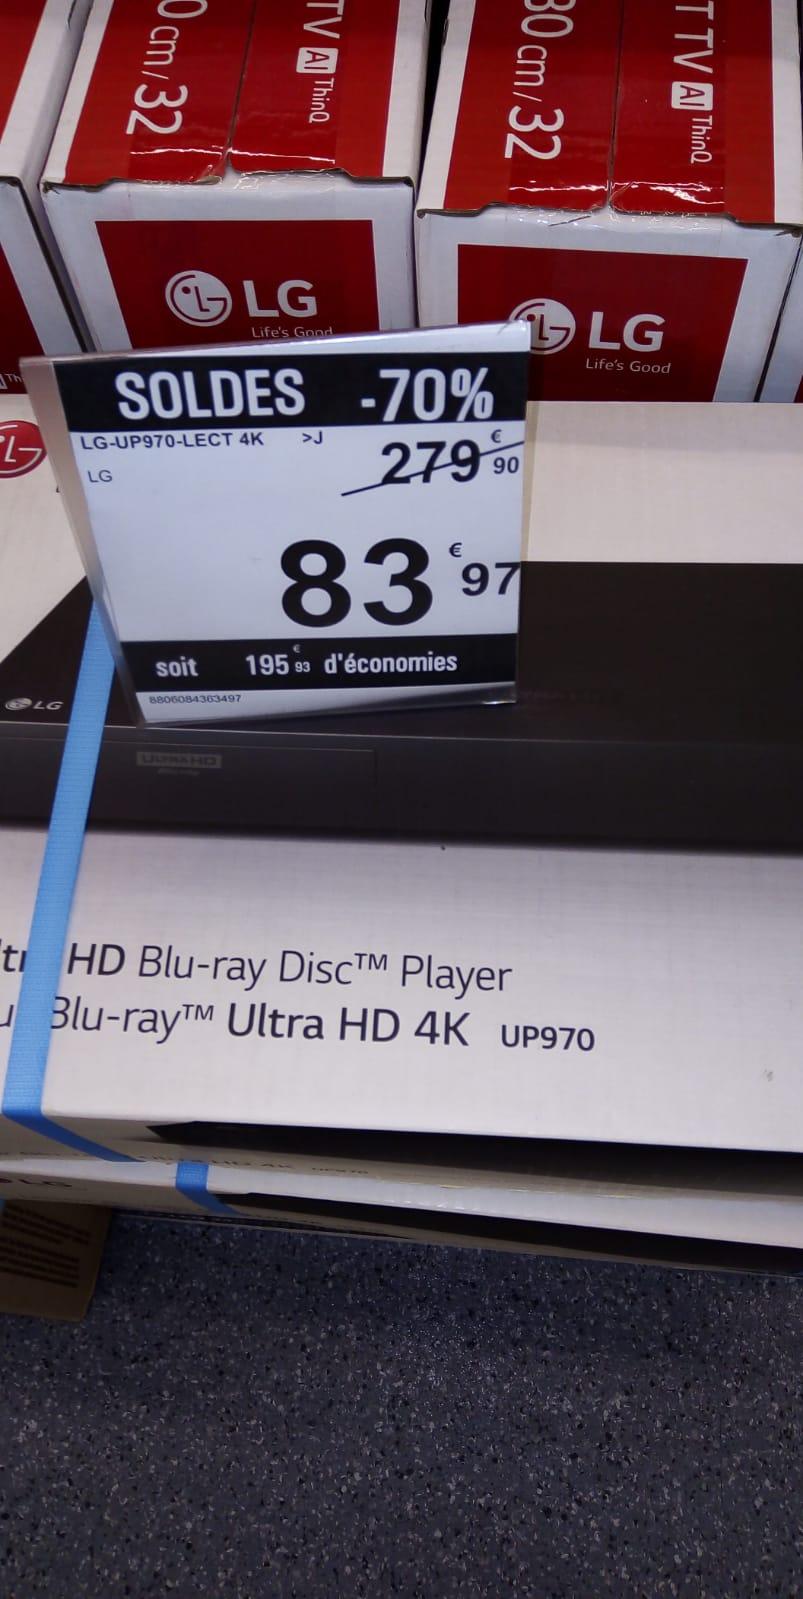 Lecteur Blu Ray LG UP970 UHD 4K - Part-Dieu Lyon (69)